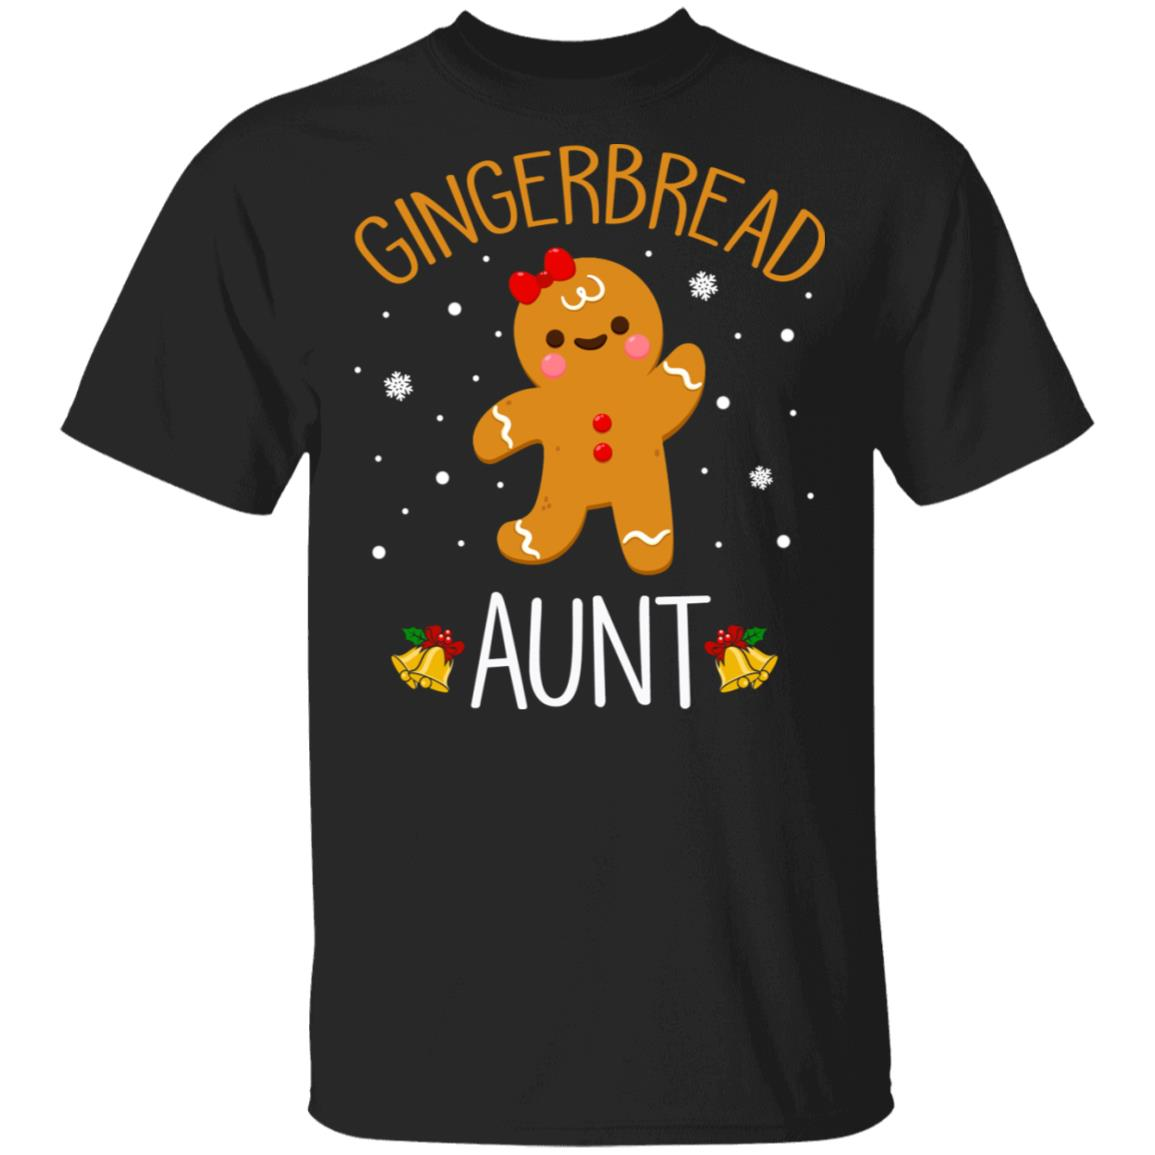 Xmas Cute Gingerbread Men Aunt Christmas Family Unisex Short Sleeve